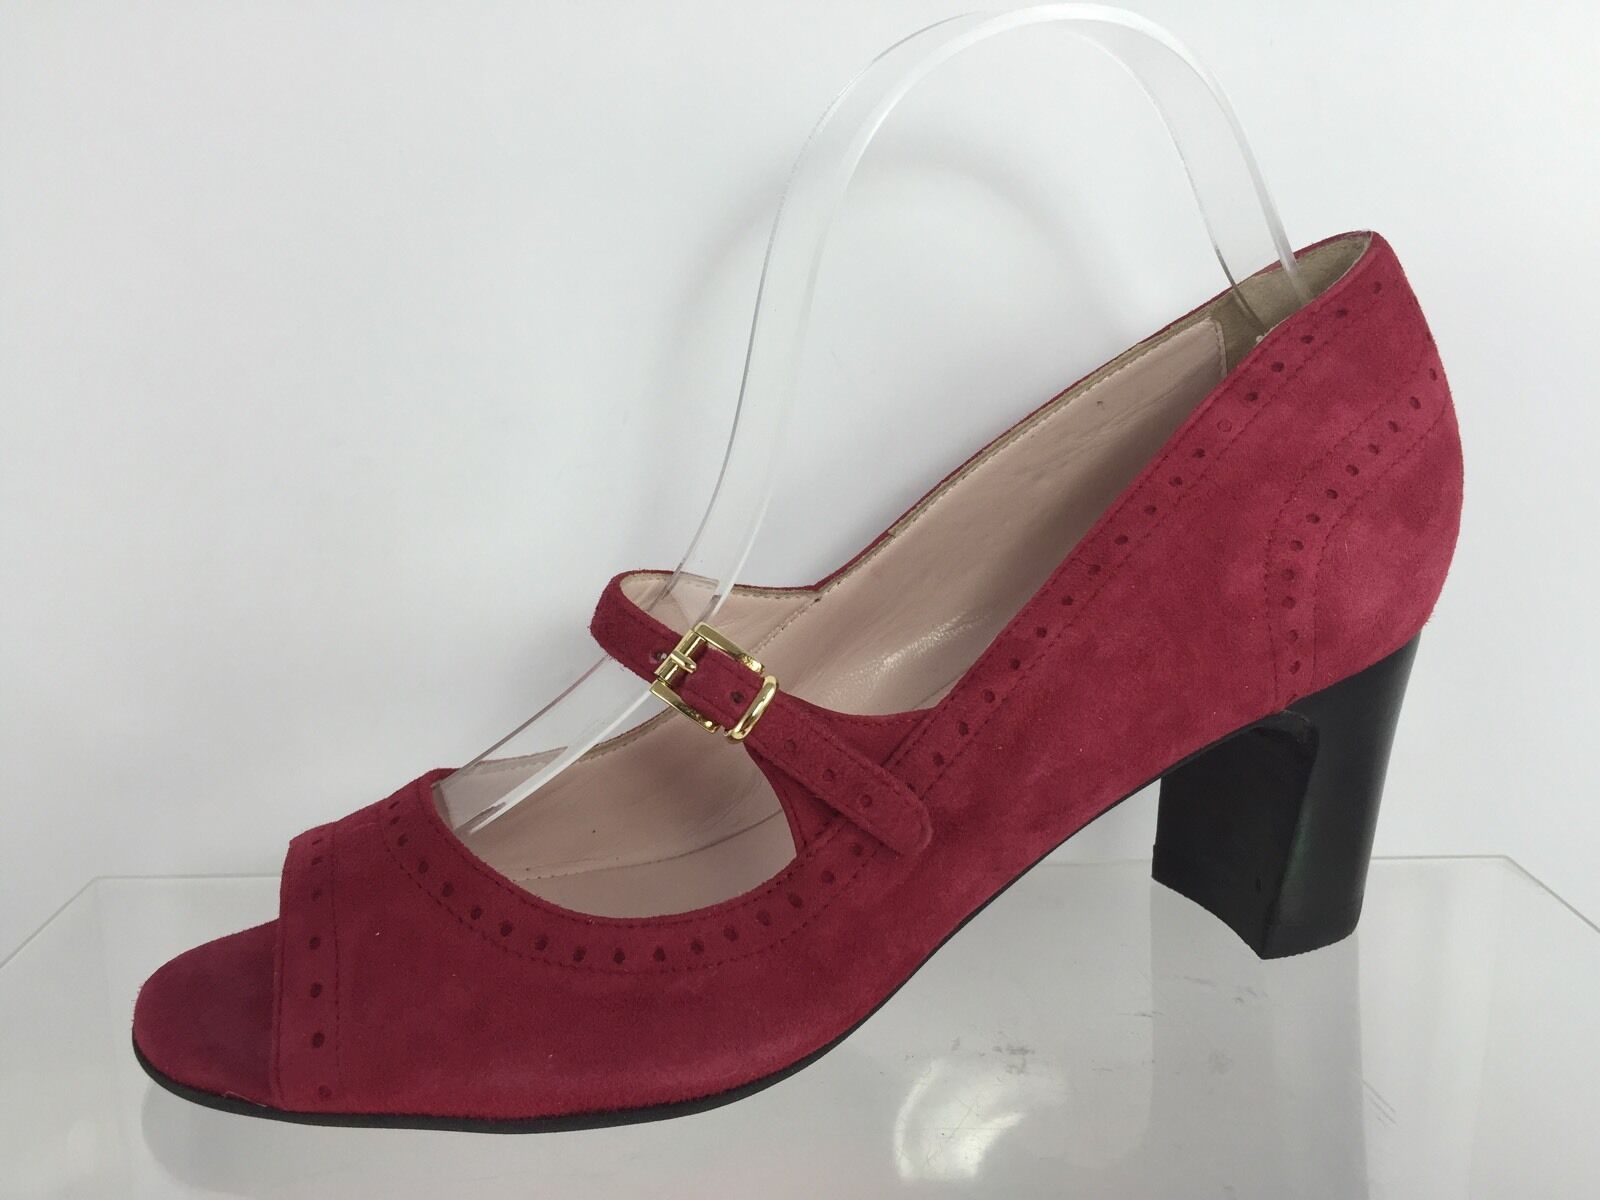 Rue Du Jour damen Magenta Magenta Magenta Leather Heels 39.5 8b9d5d